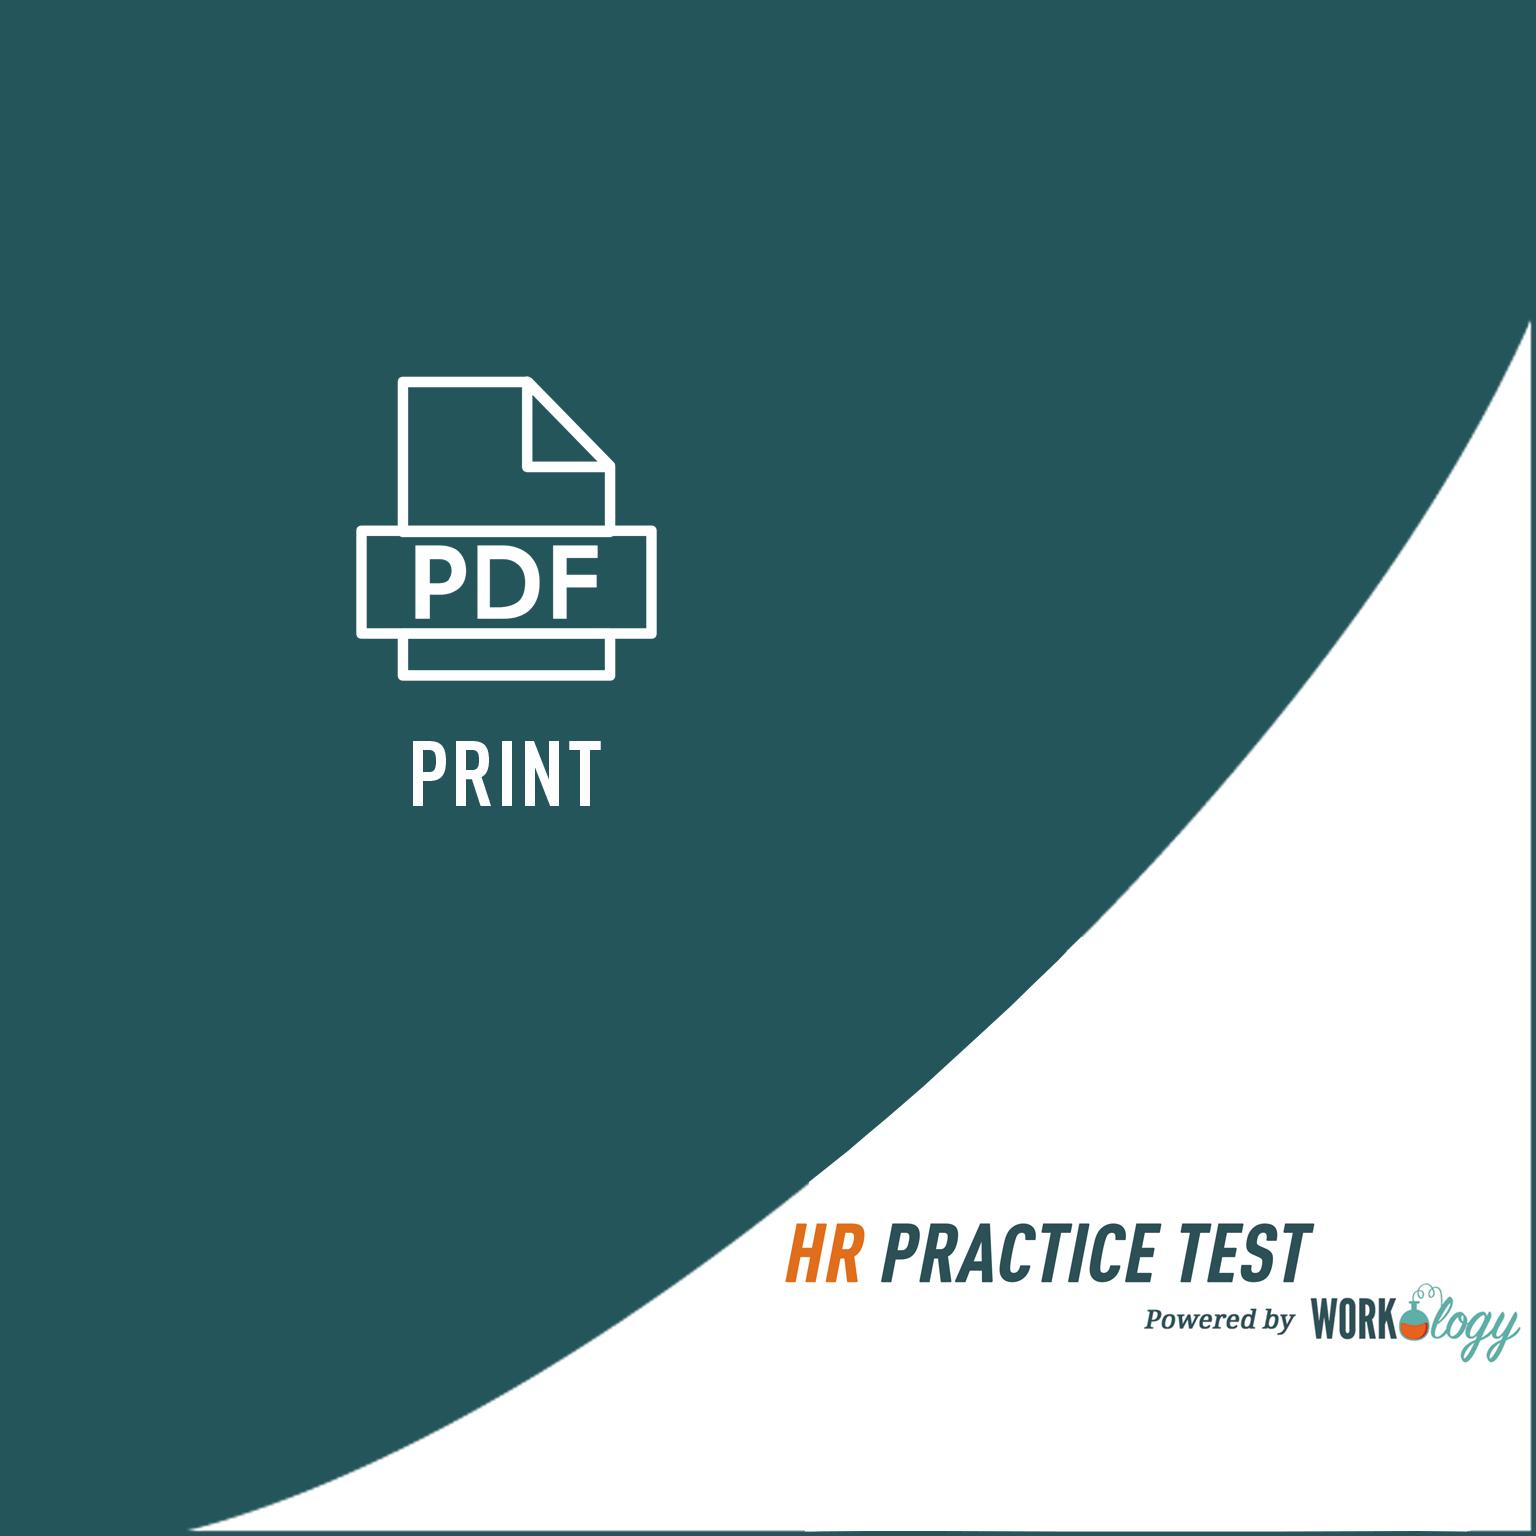 HR Practice test (print)